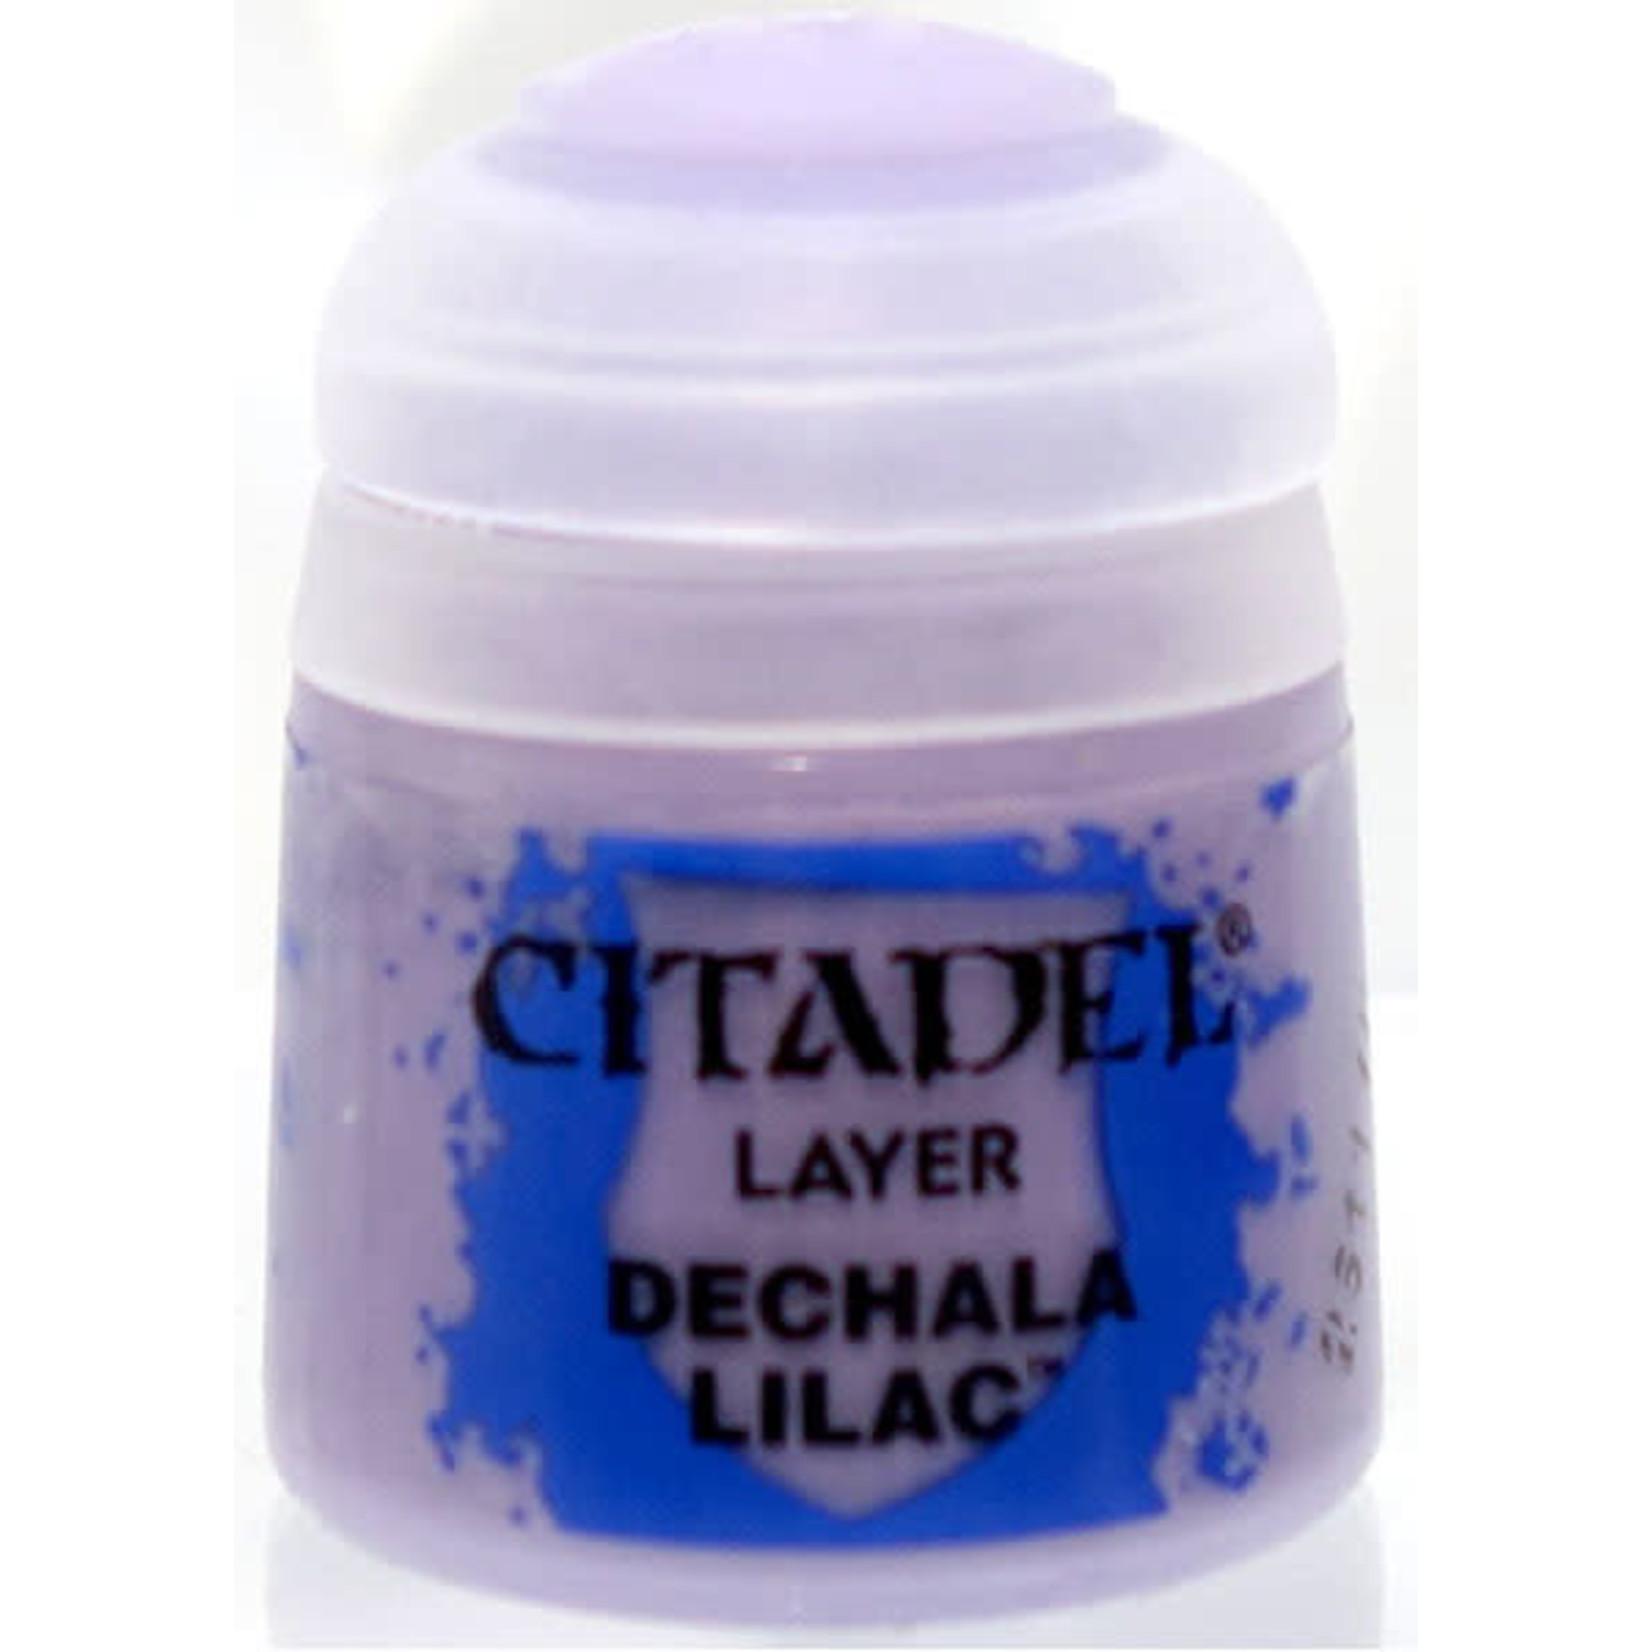 Games Workshop Citadel Paint: Dechala Lilac 12ml